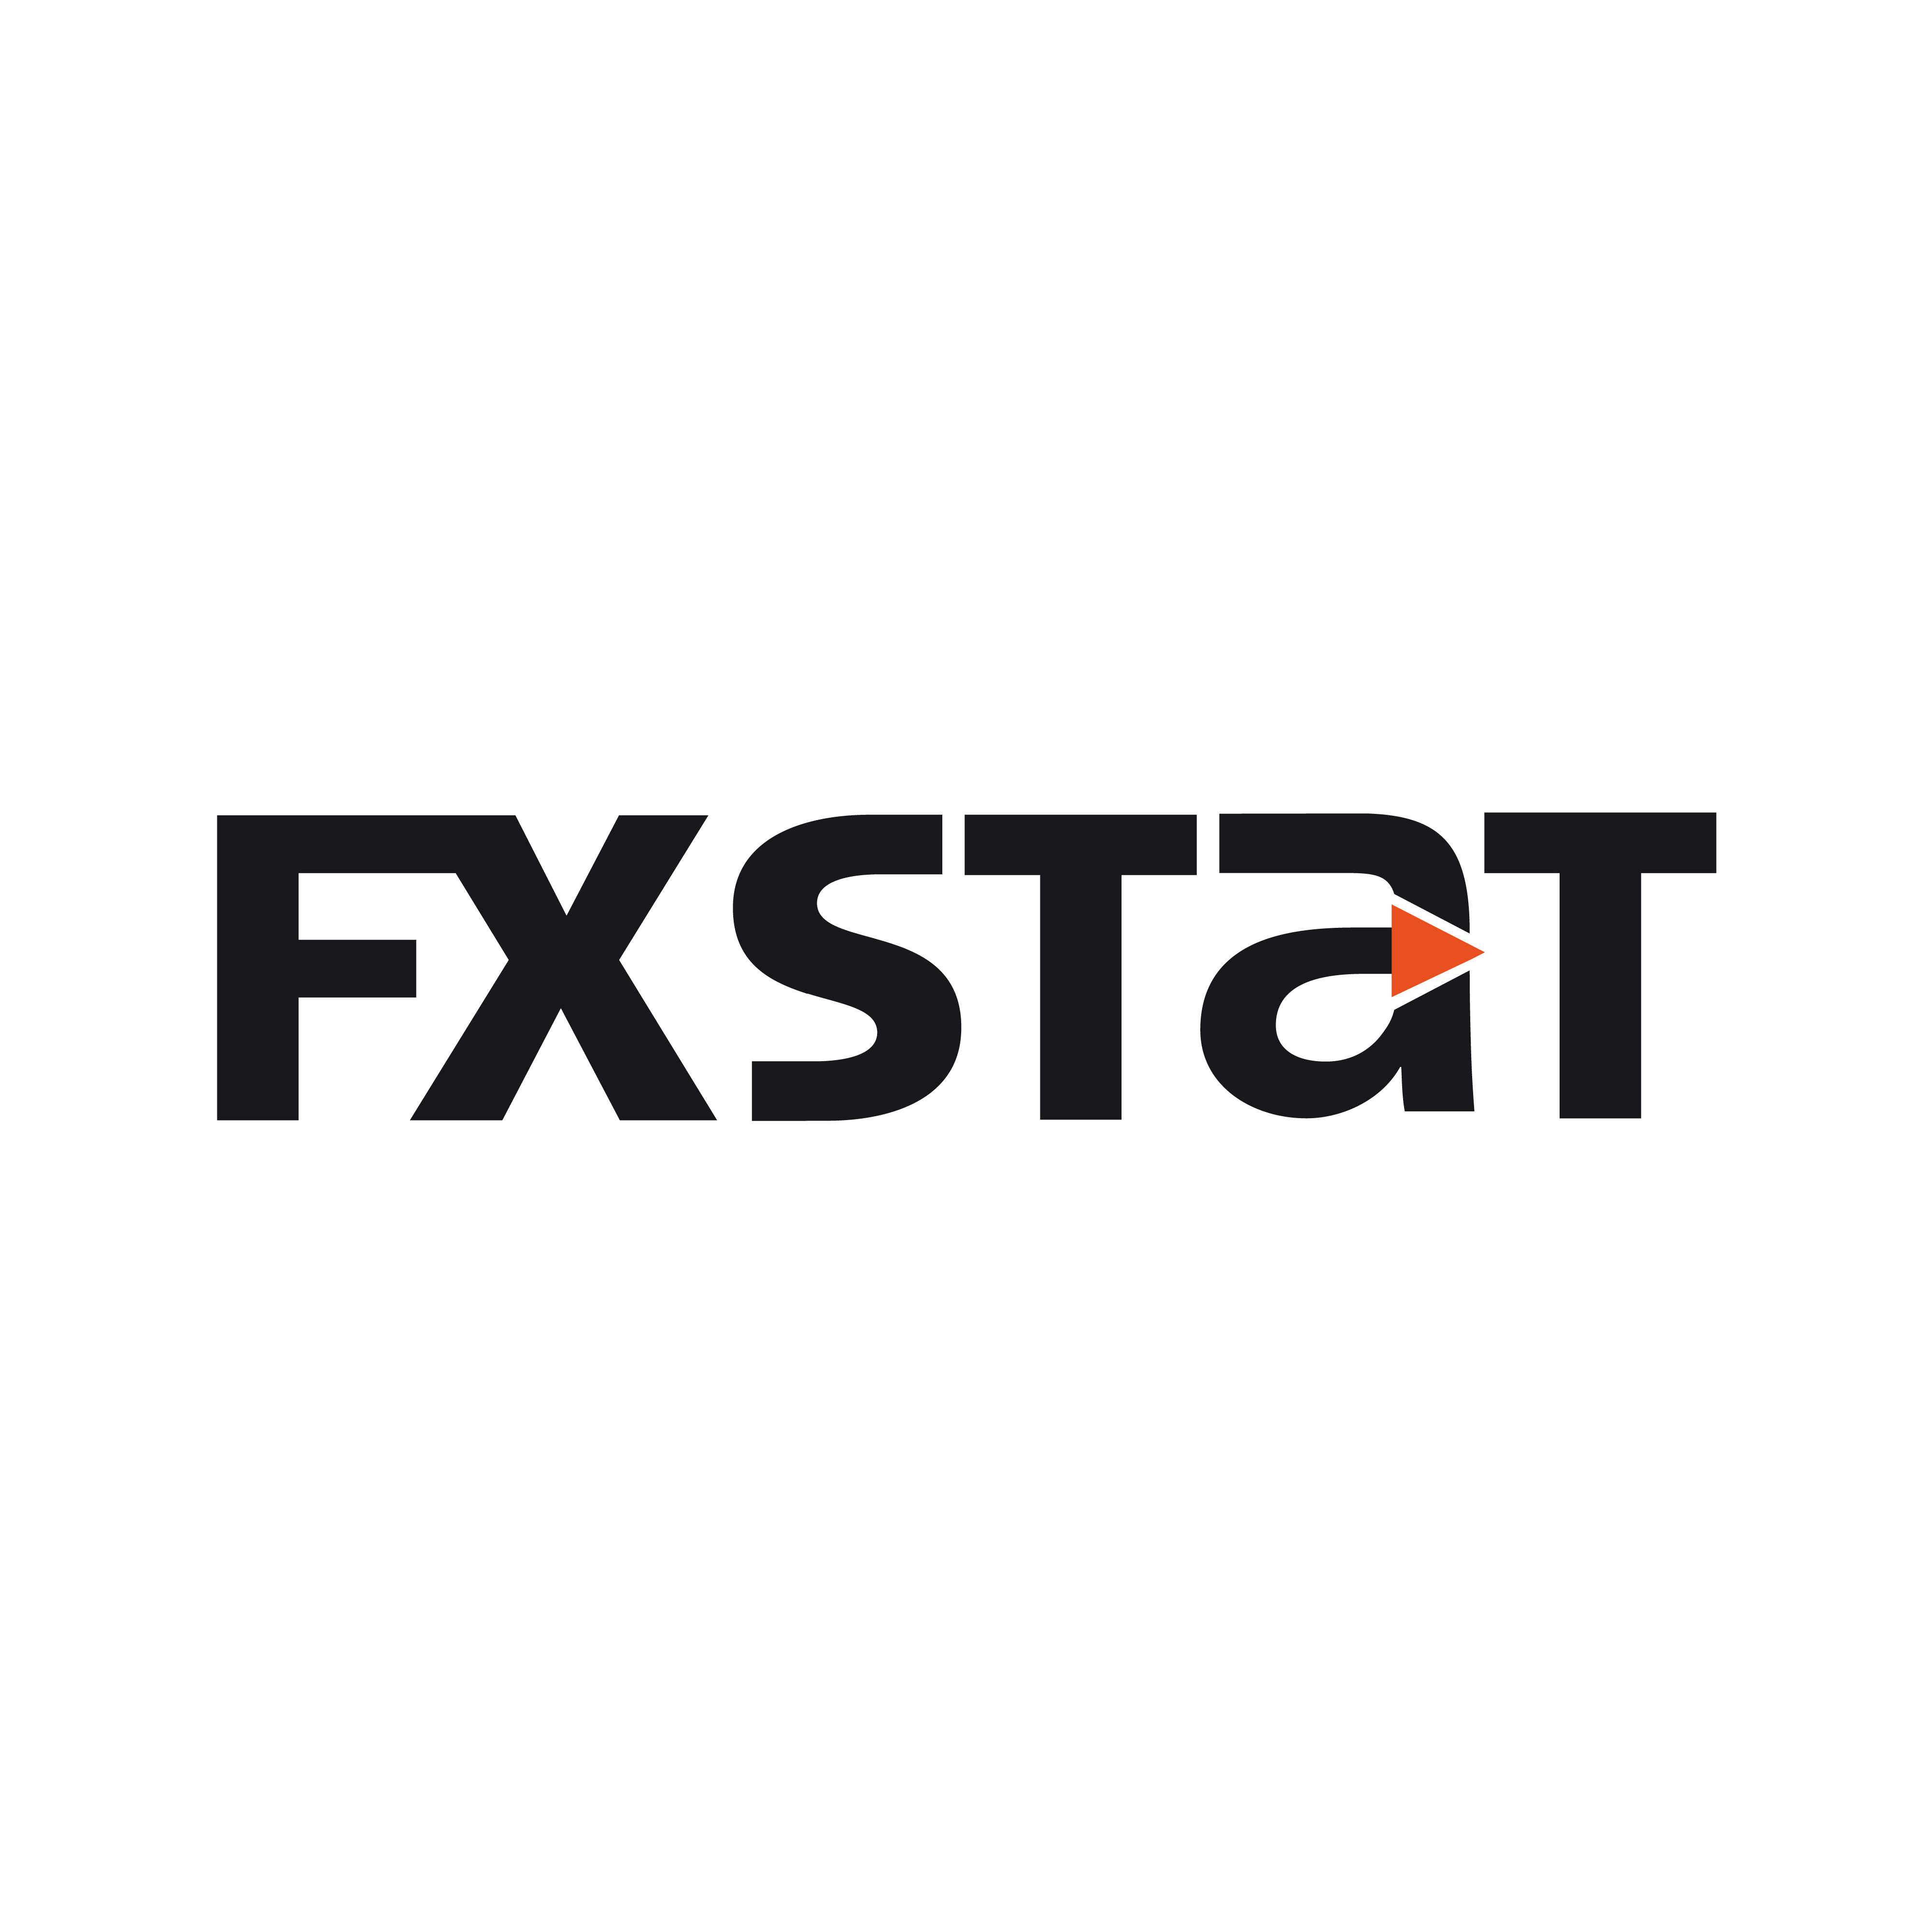 fxstat_square_logo